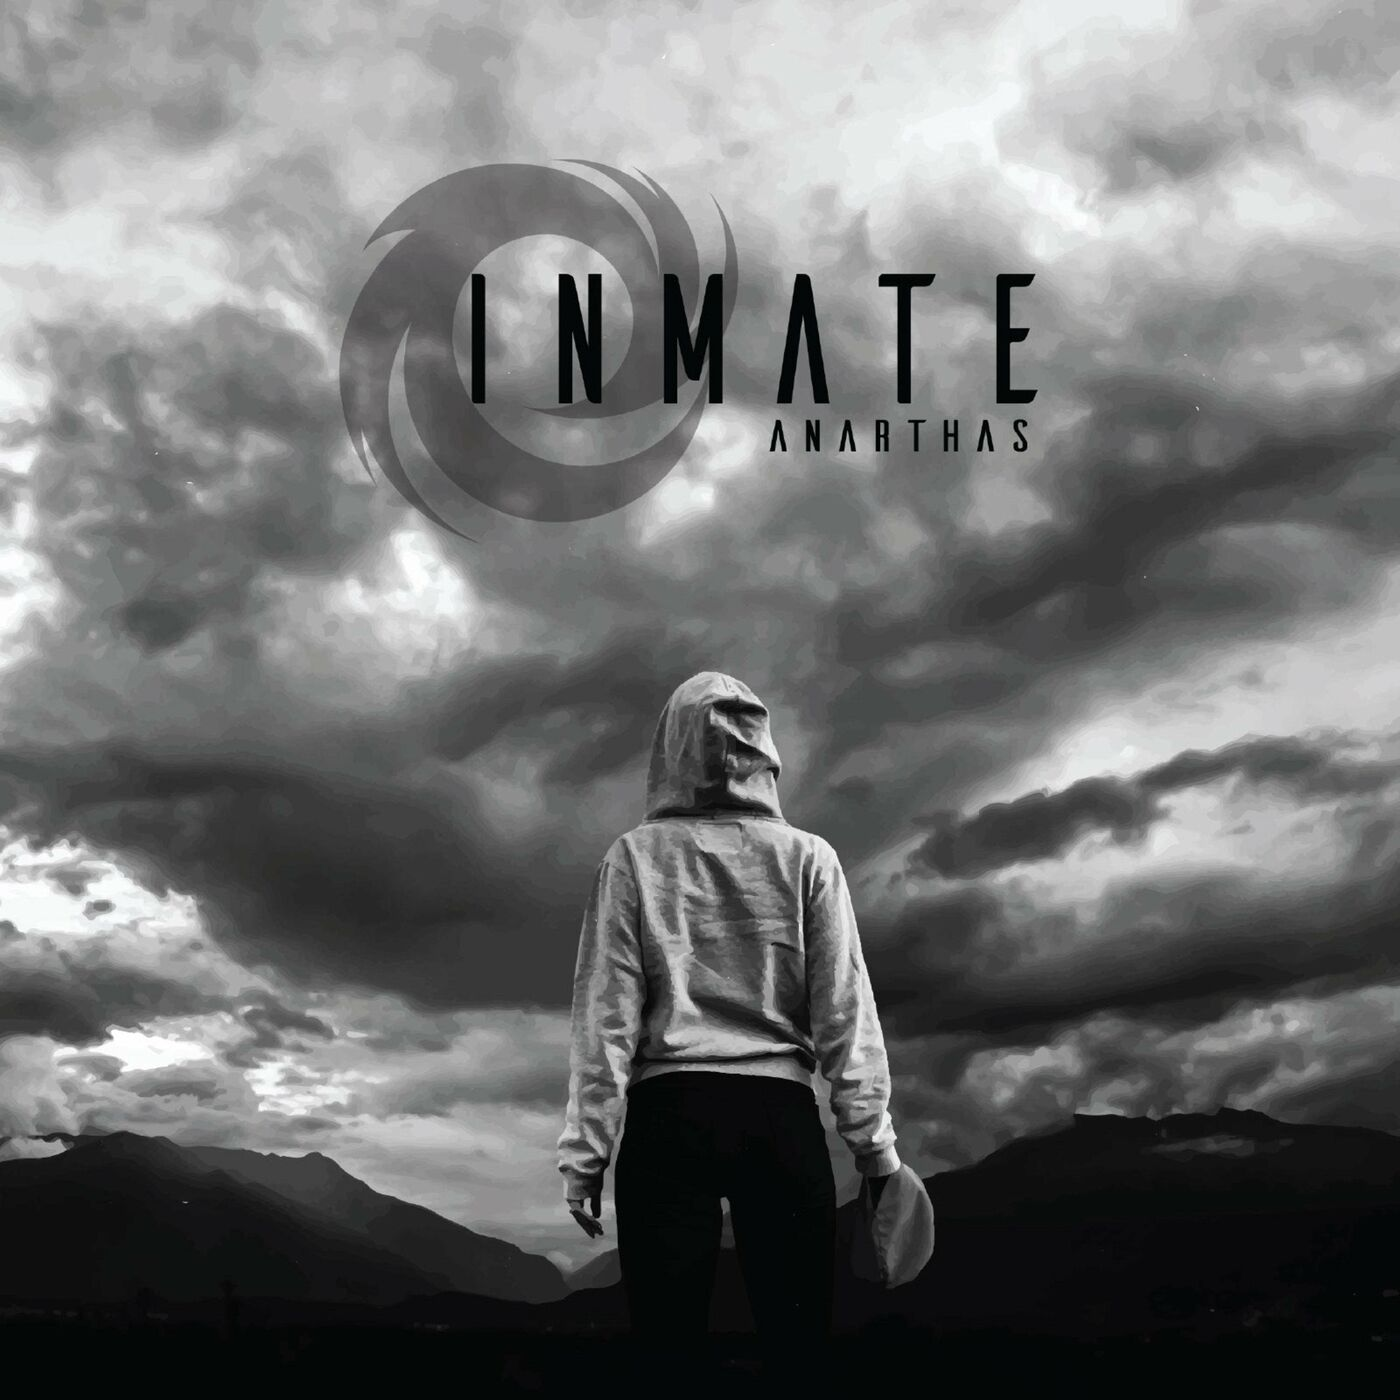 Inmate - Anarthas (Instrumental) (2021)